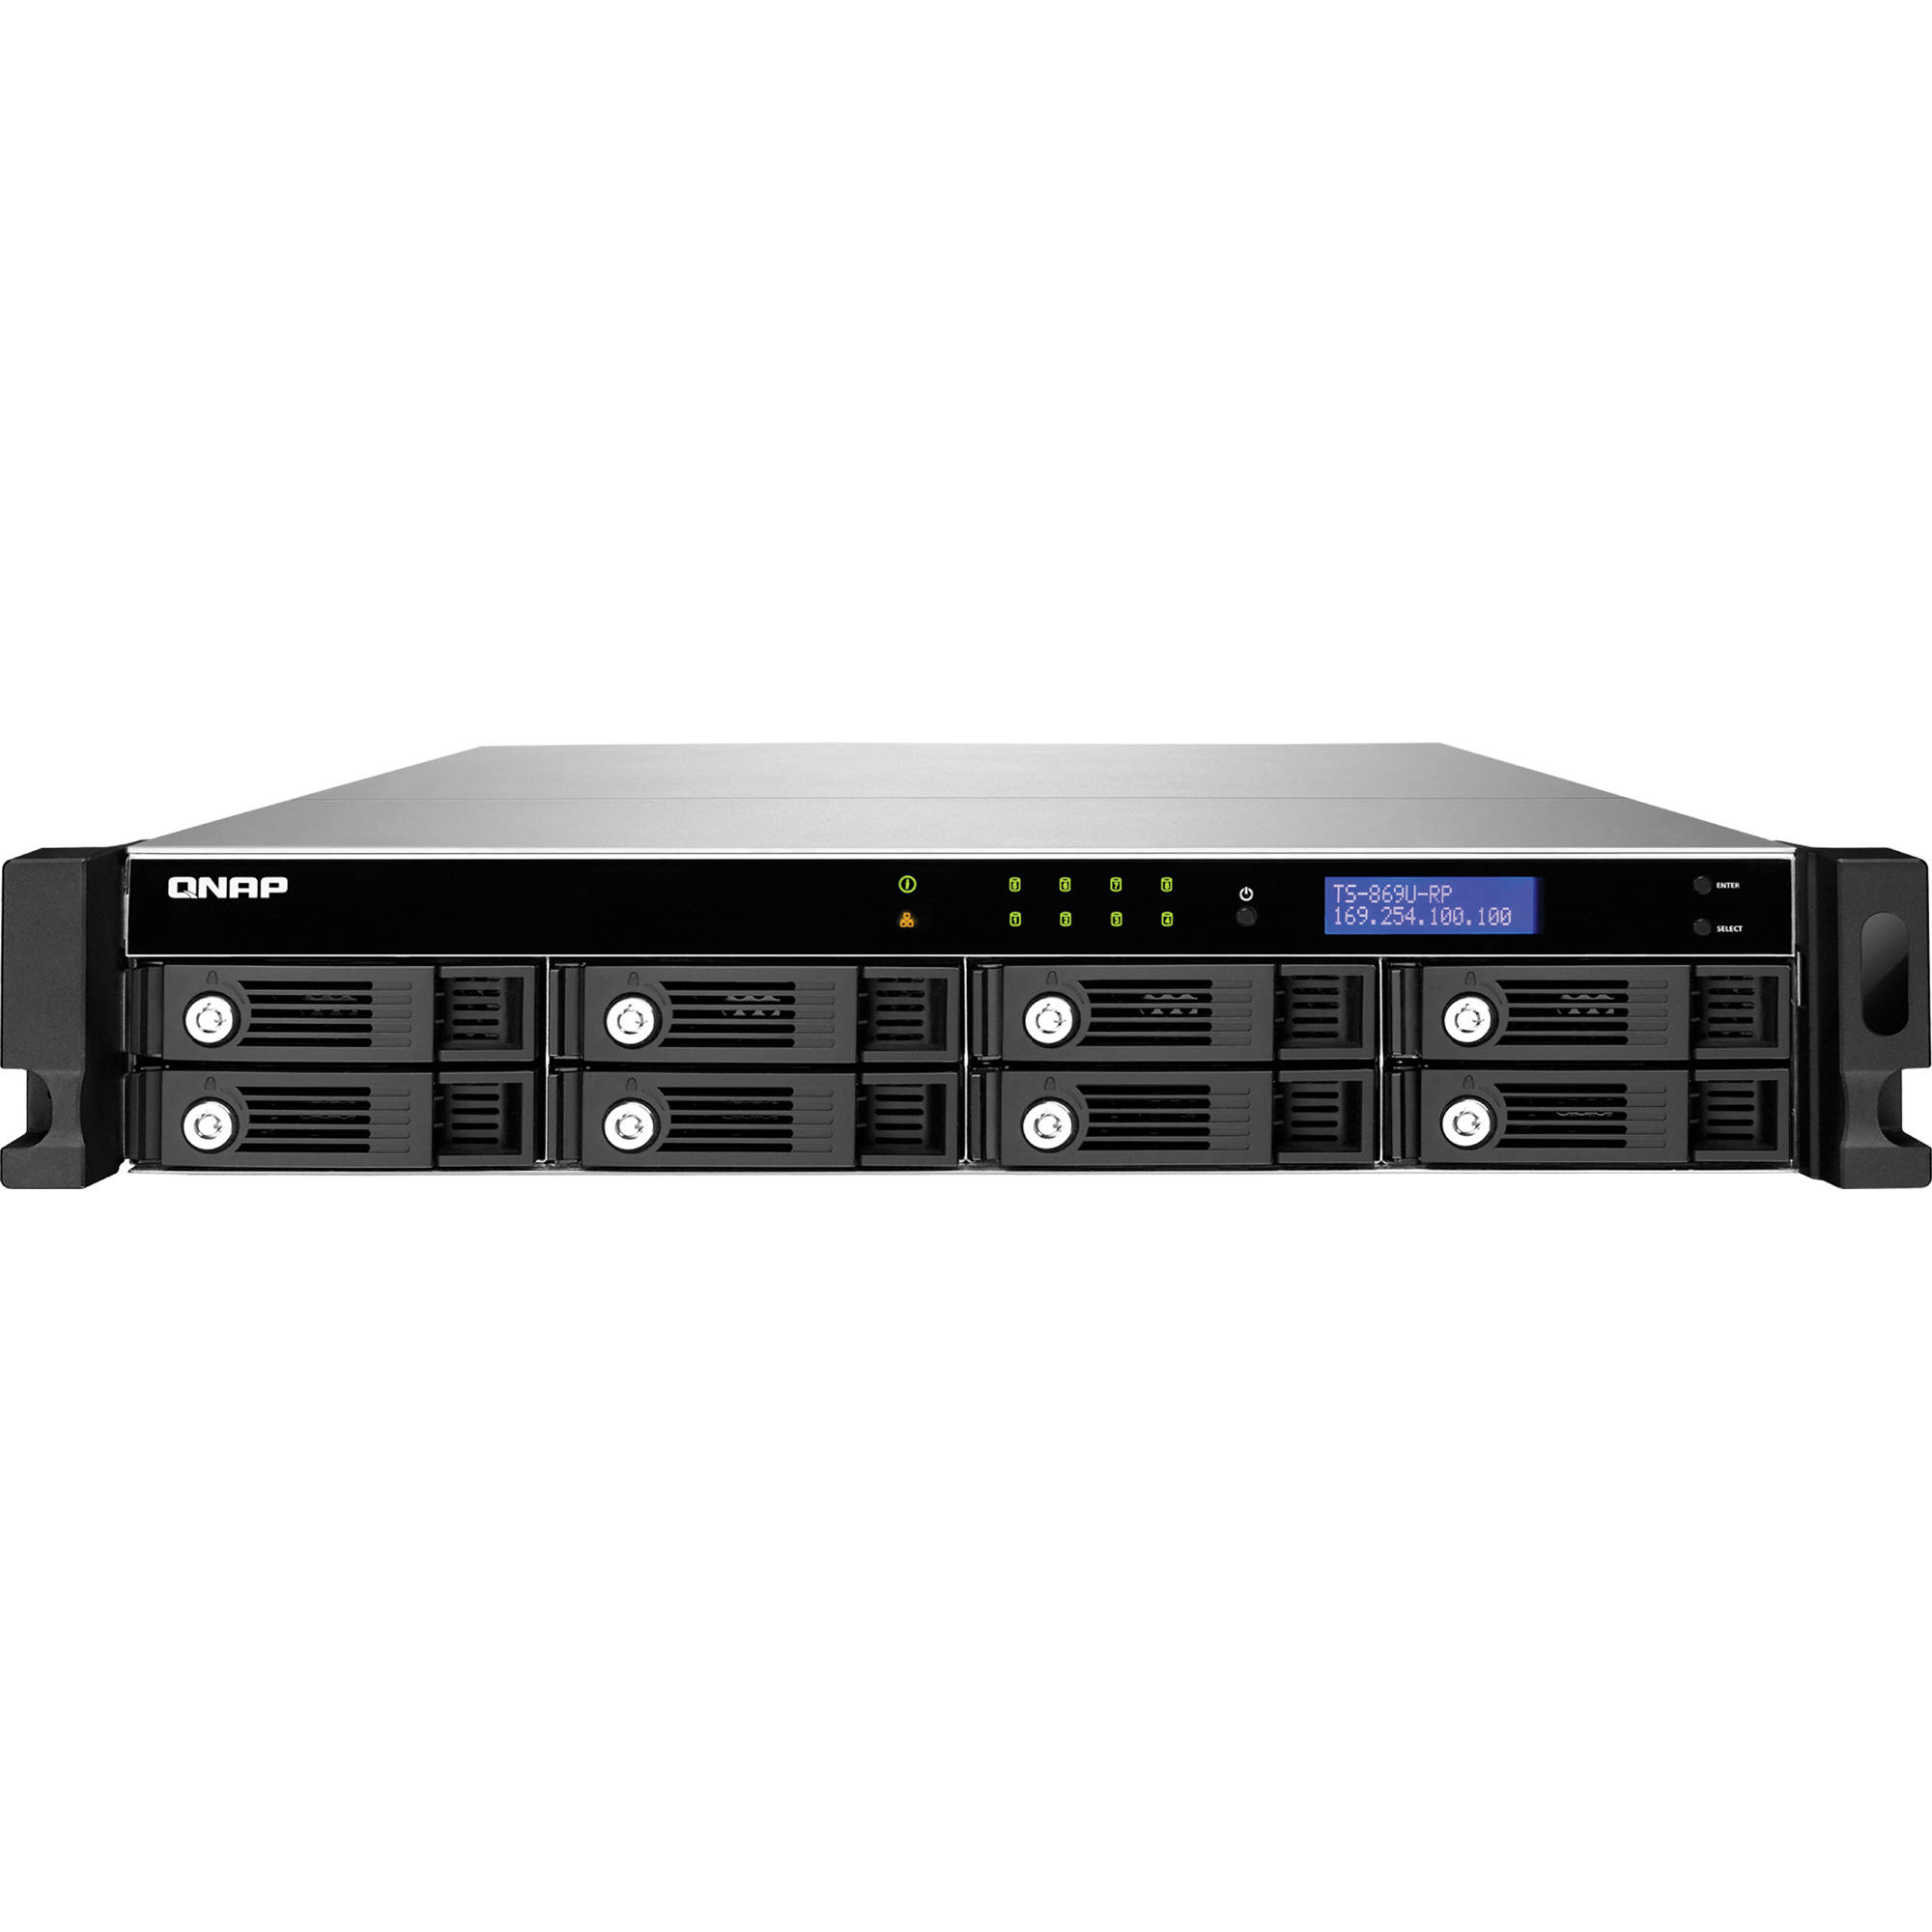 QNAP TS-869U-RP 8-Bay 2U SATA Turbo NAS Server for SMBs